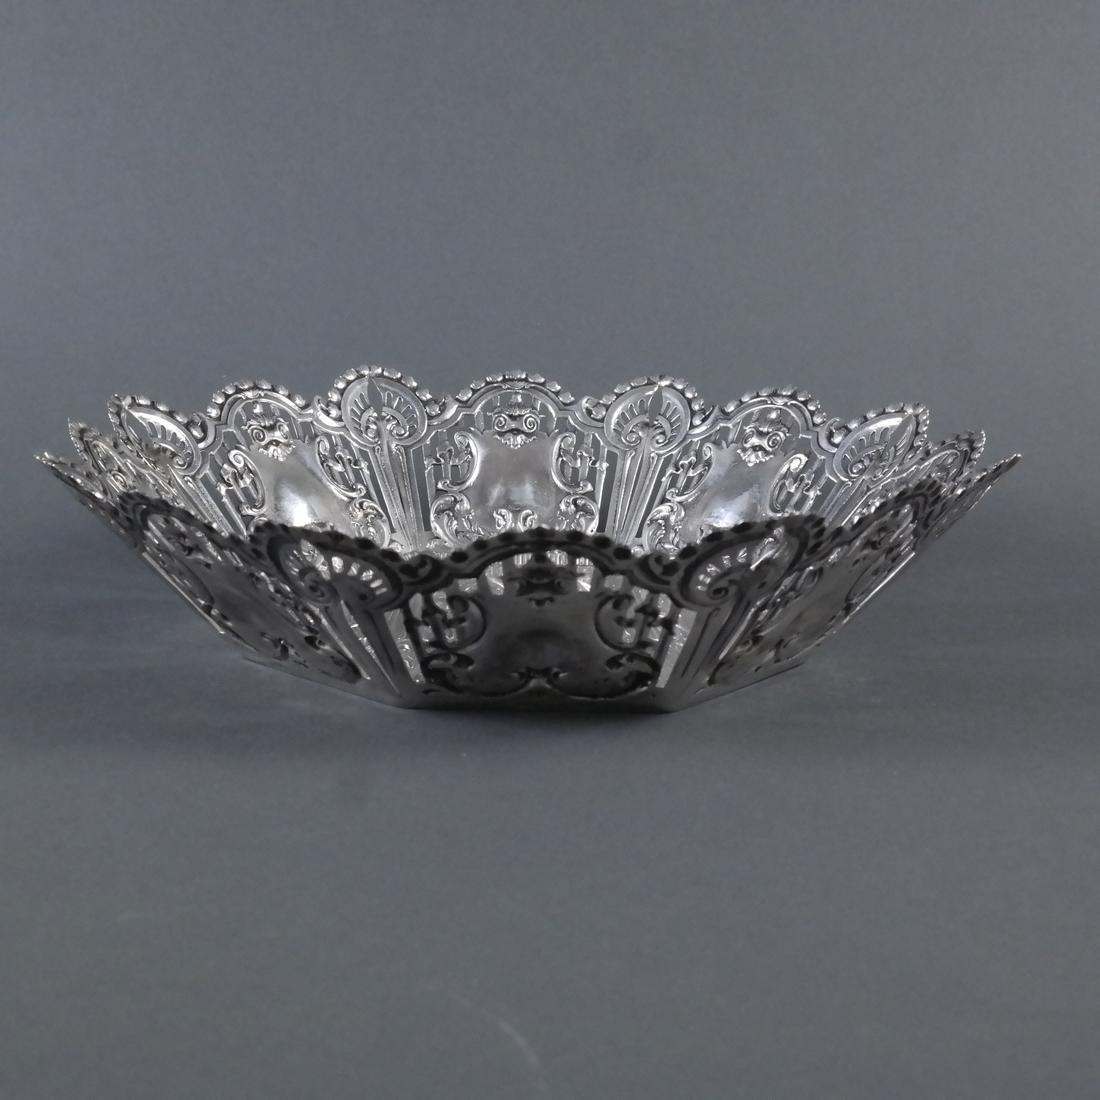 .900 Standard Silver Ornate Centerpiece - 3